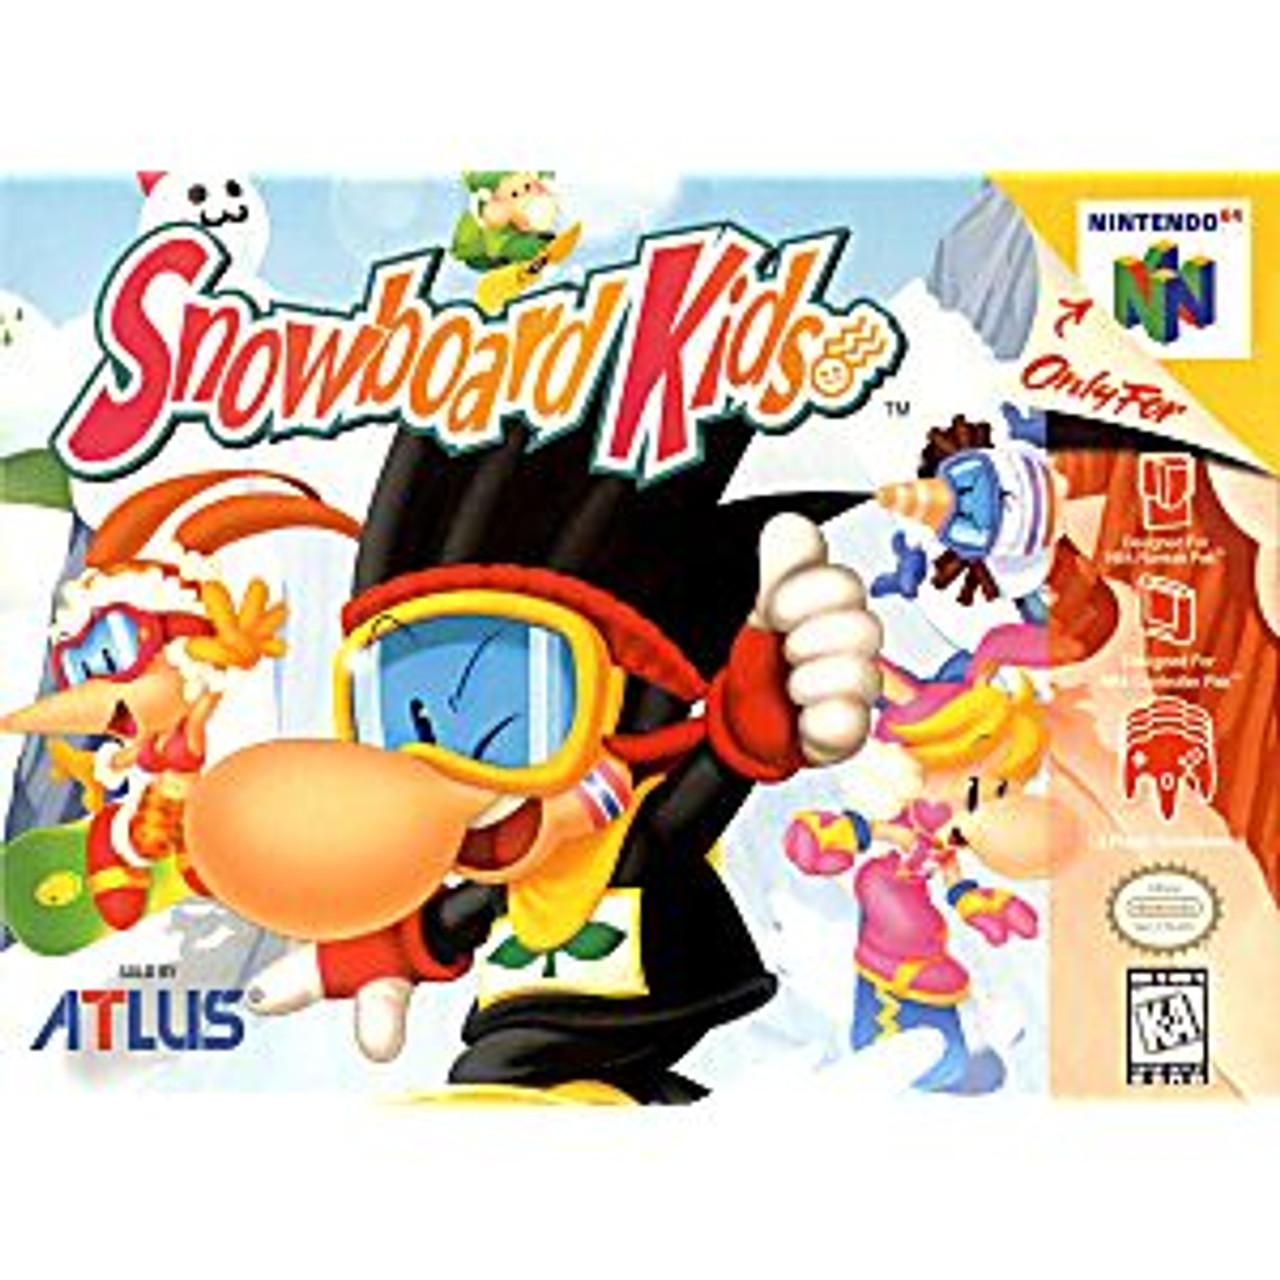 SNOWBOARD KIDS  - N64